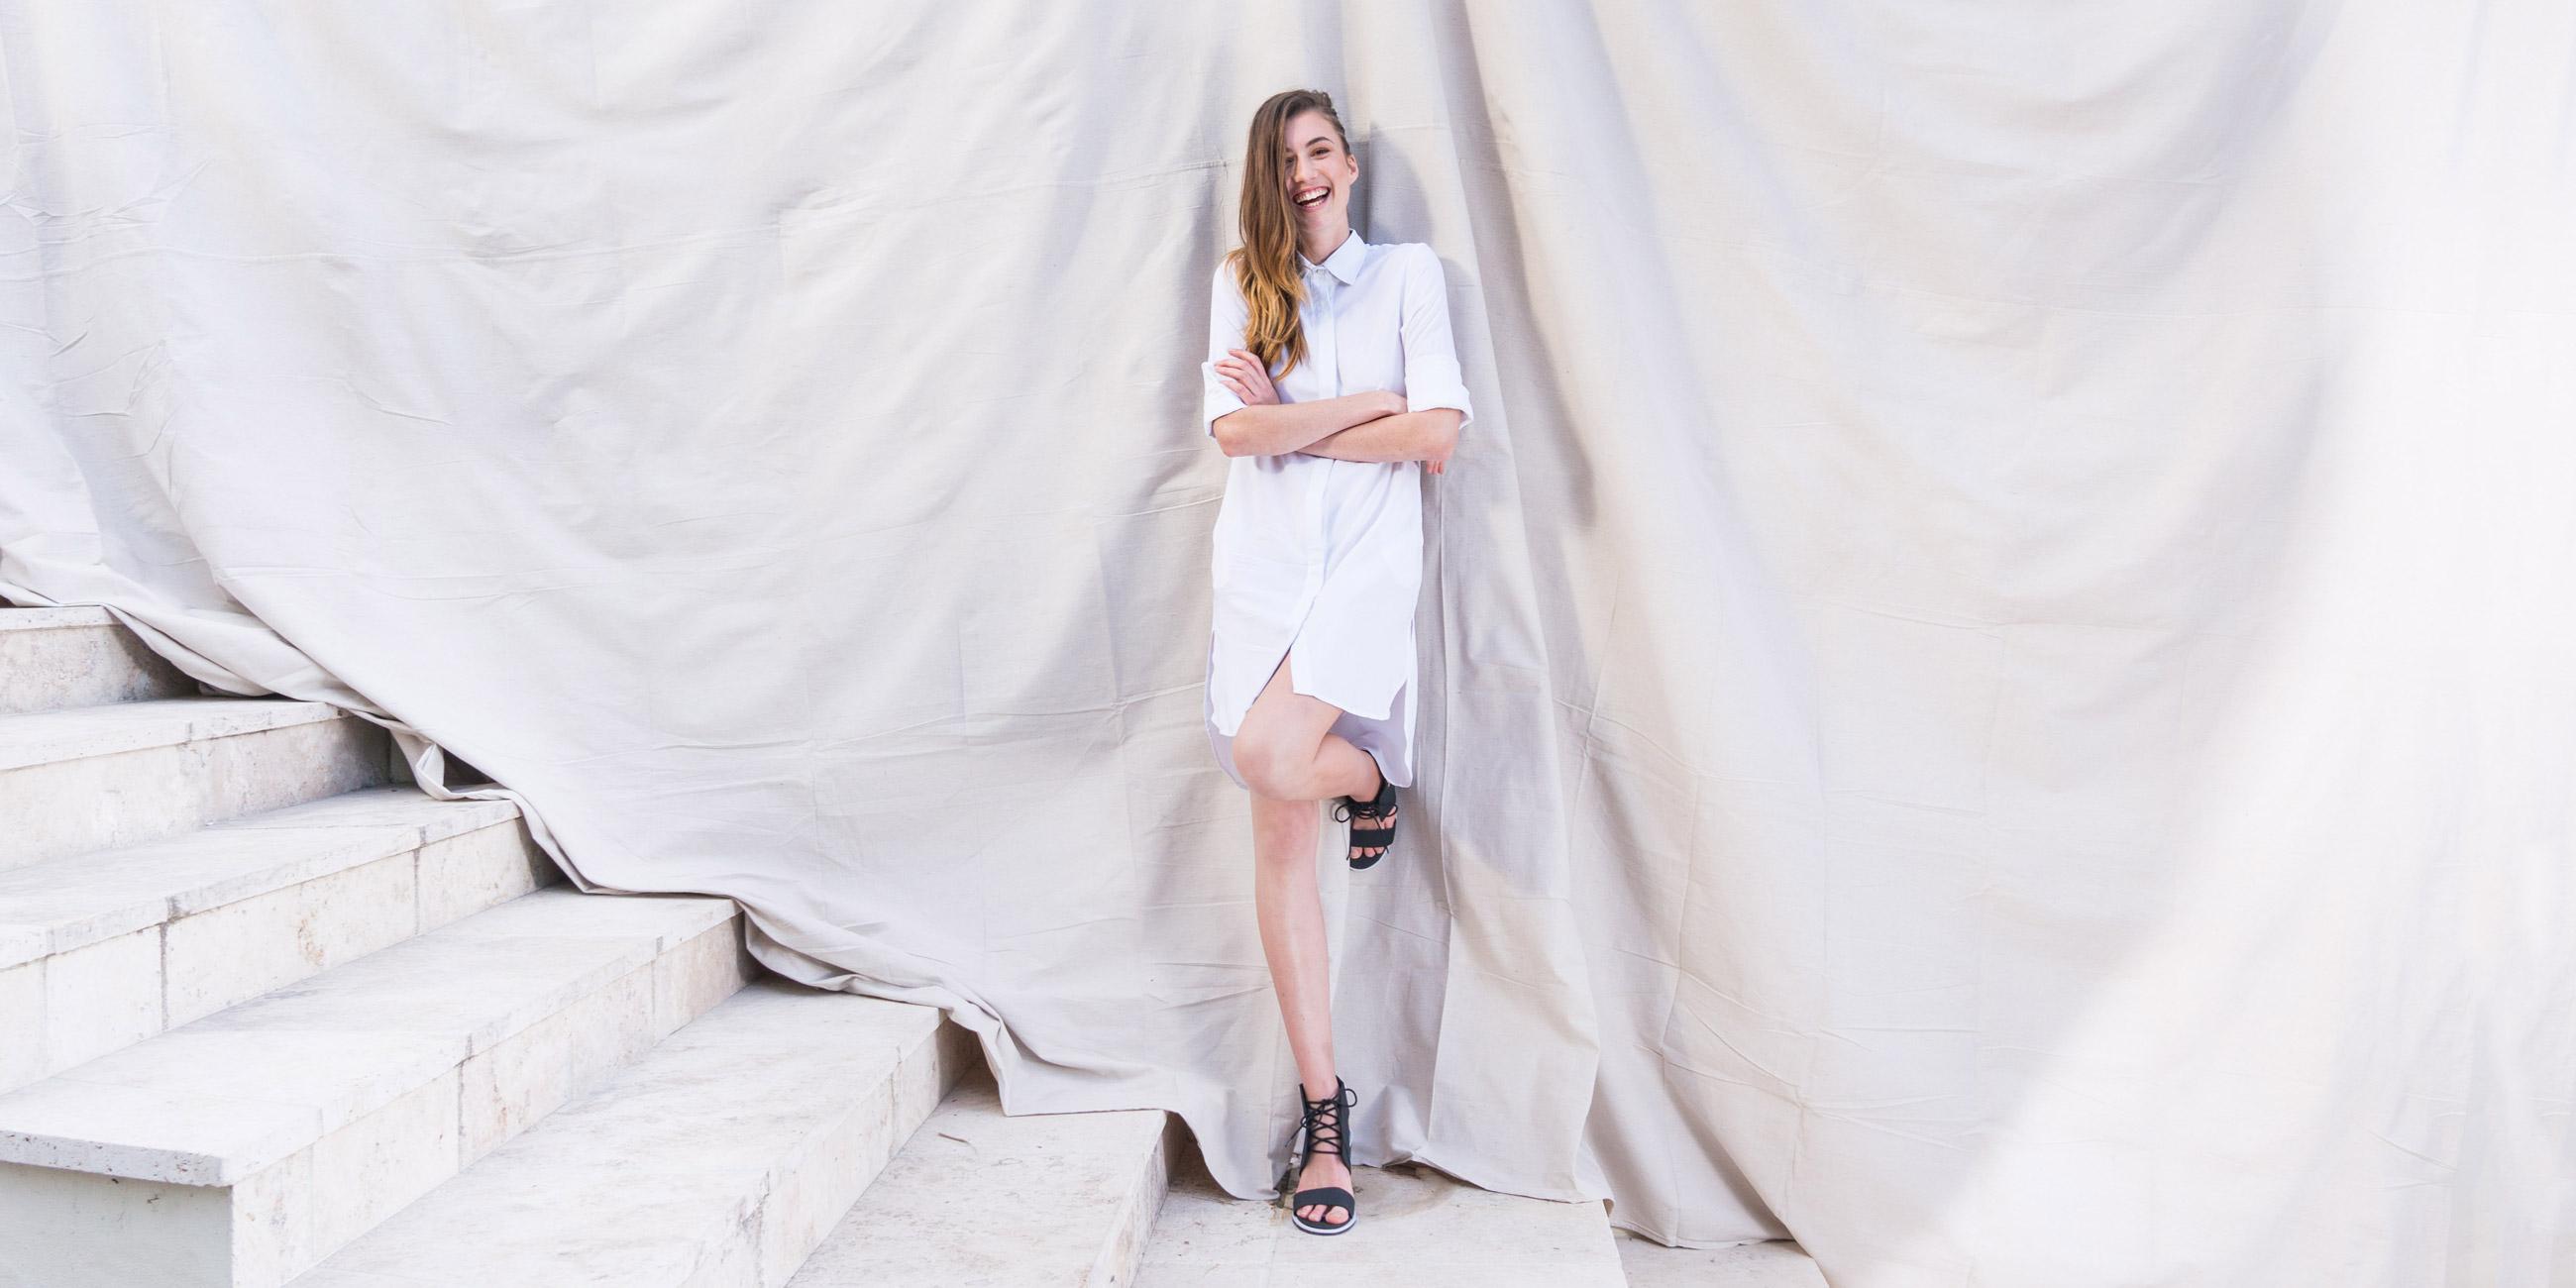 Bamboo Material Eco Friendly Fashion White Shirt Dress